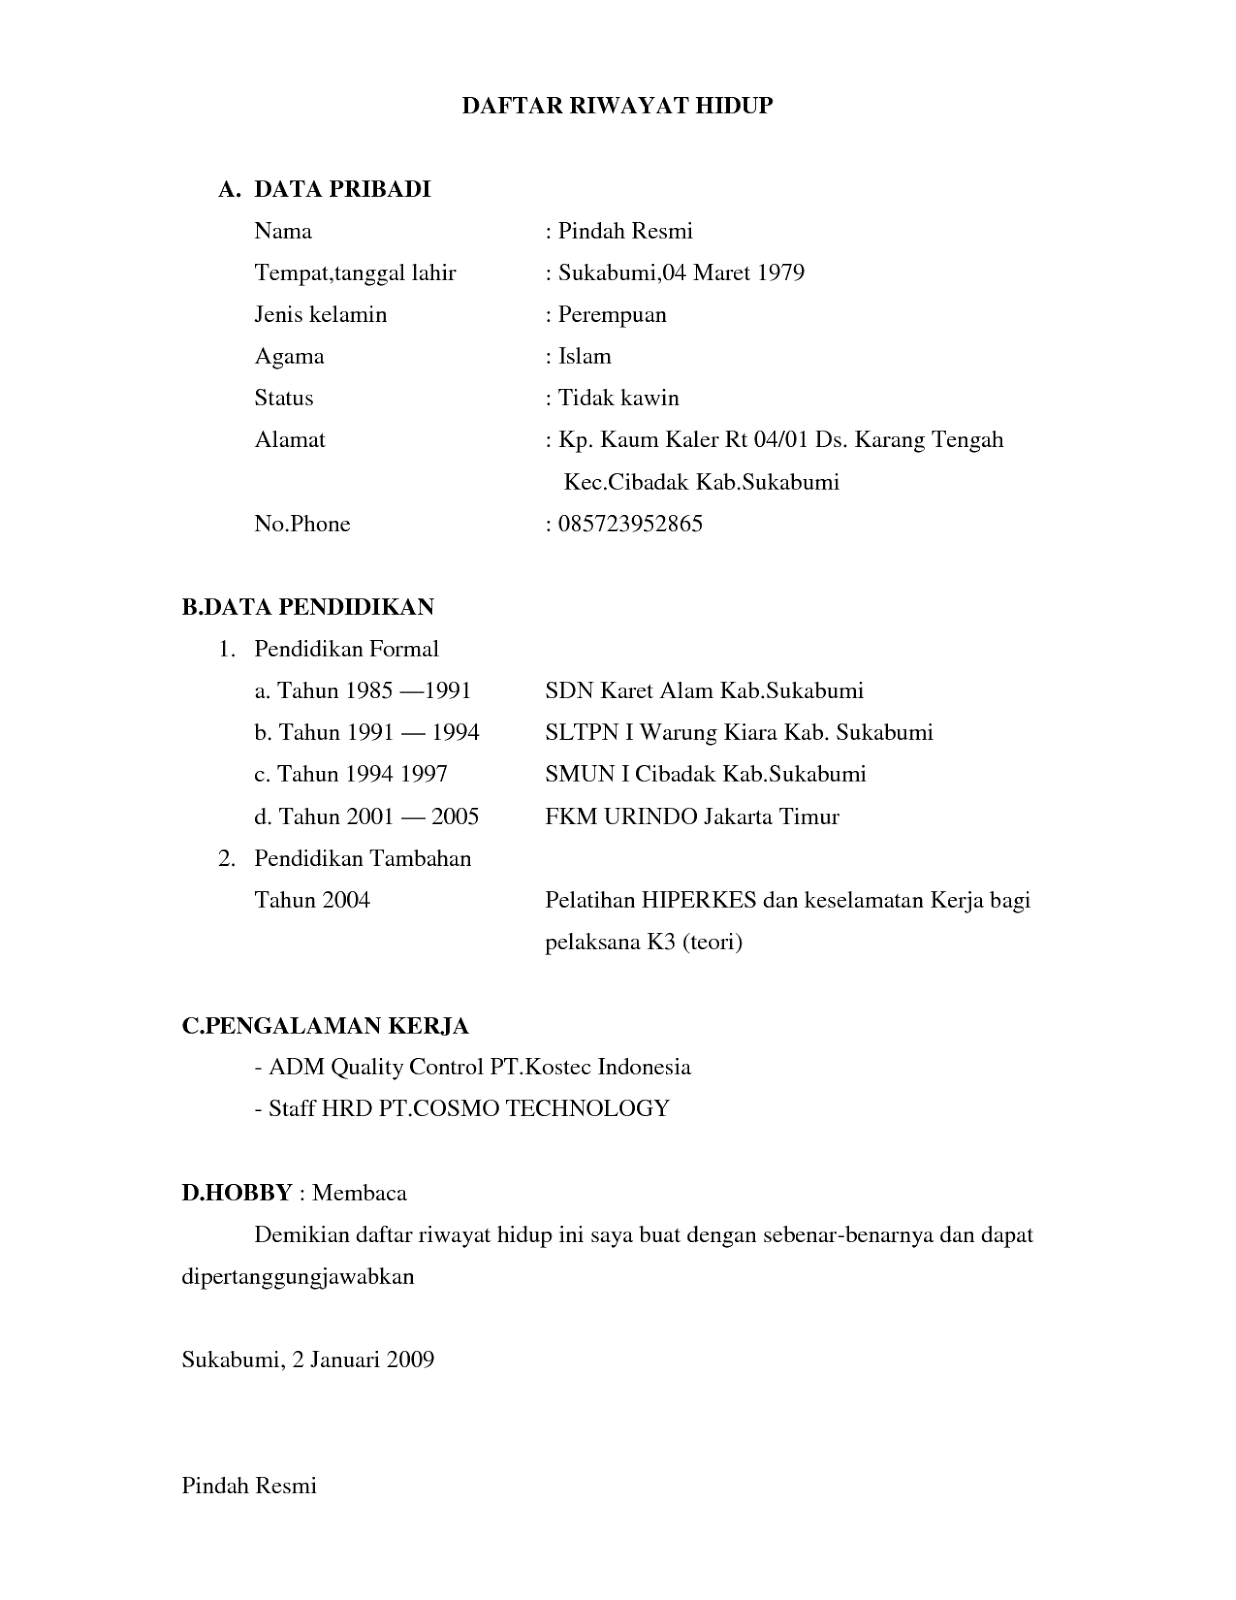 Contoh Daftar Riwayat Hidup Terbaru 2012 Cv Nabila